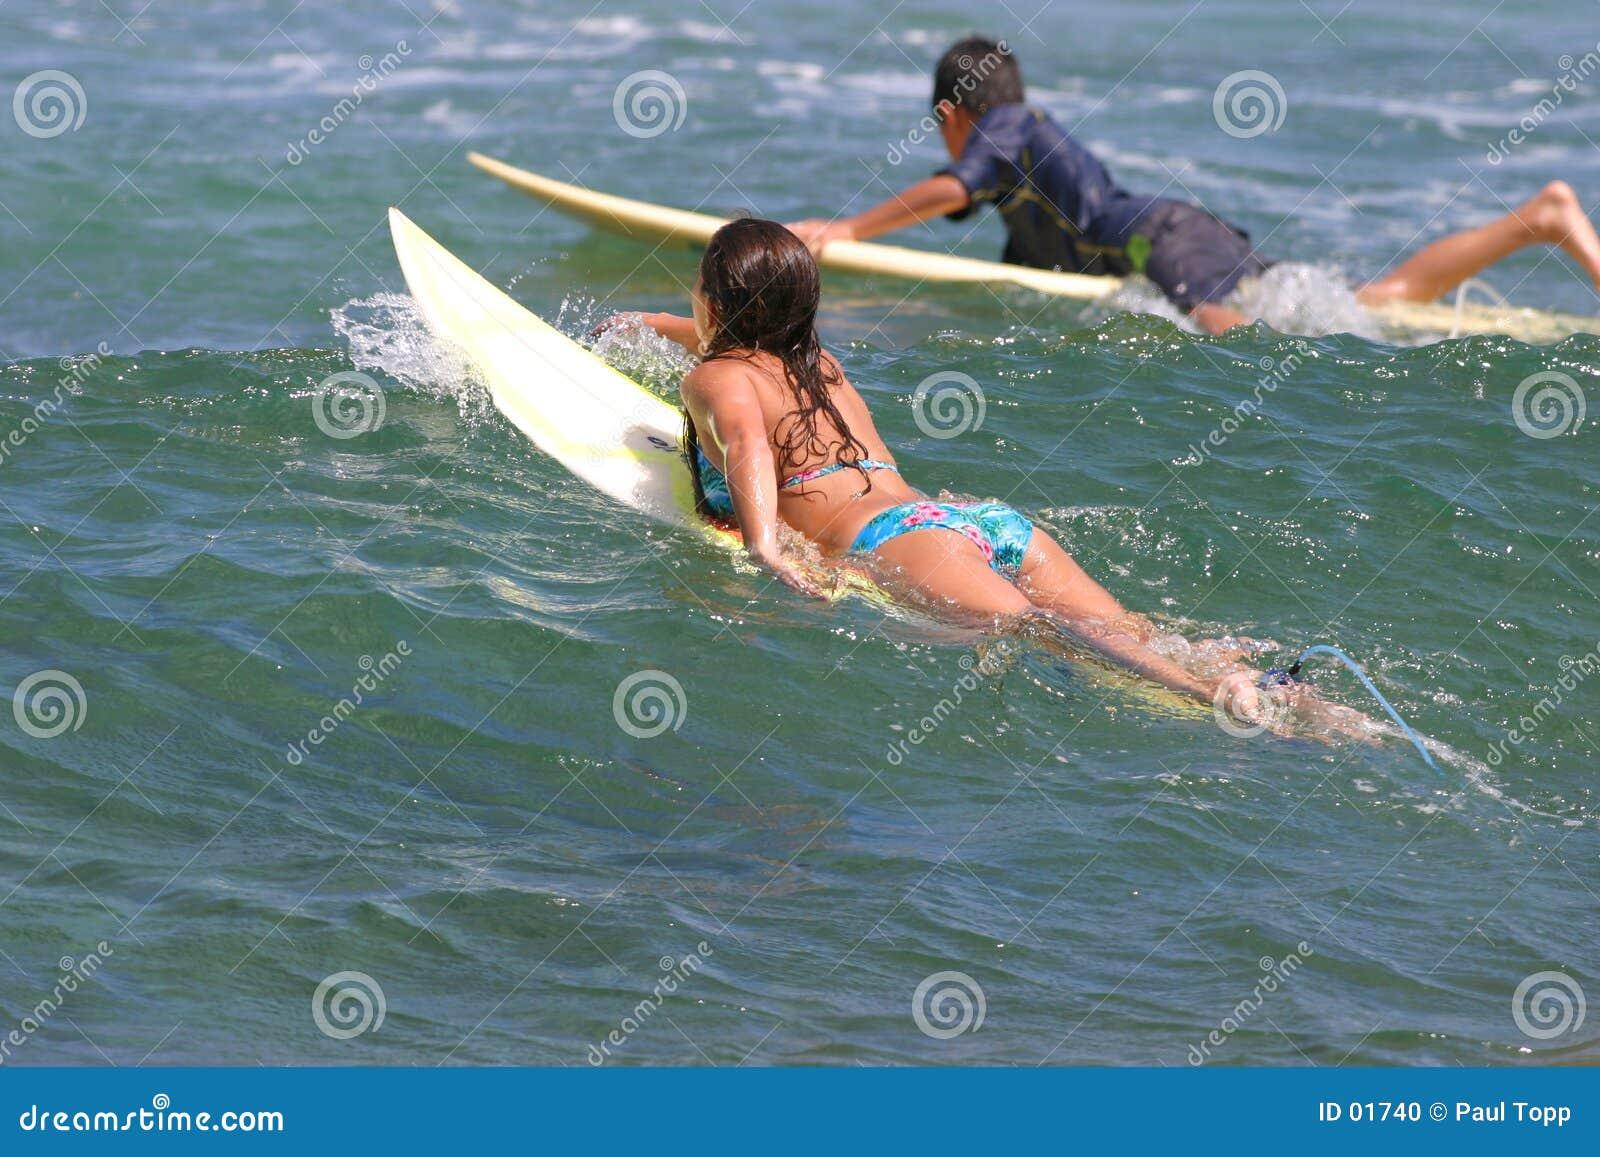 Vaya a practicar surf